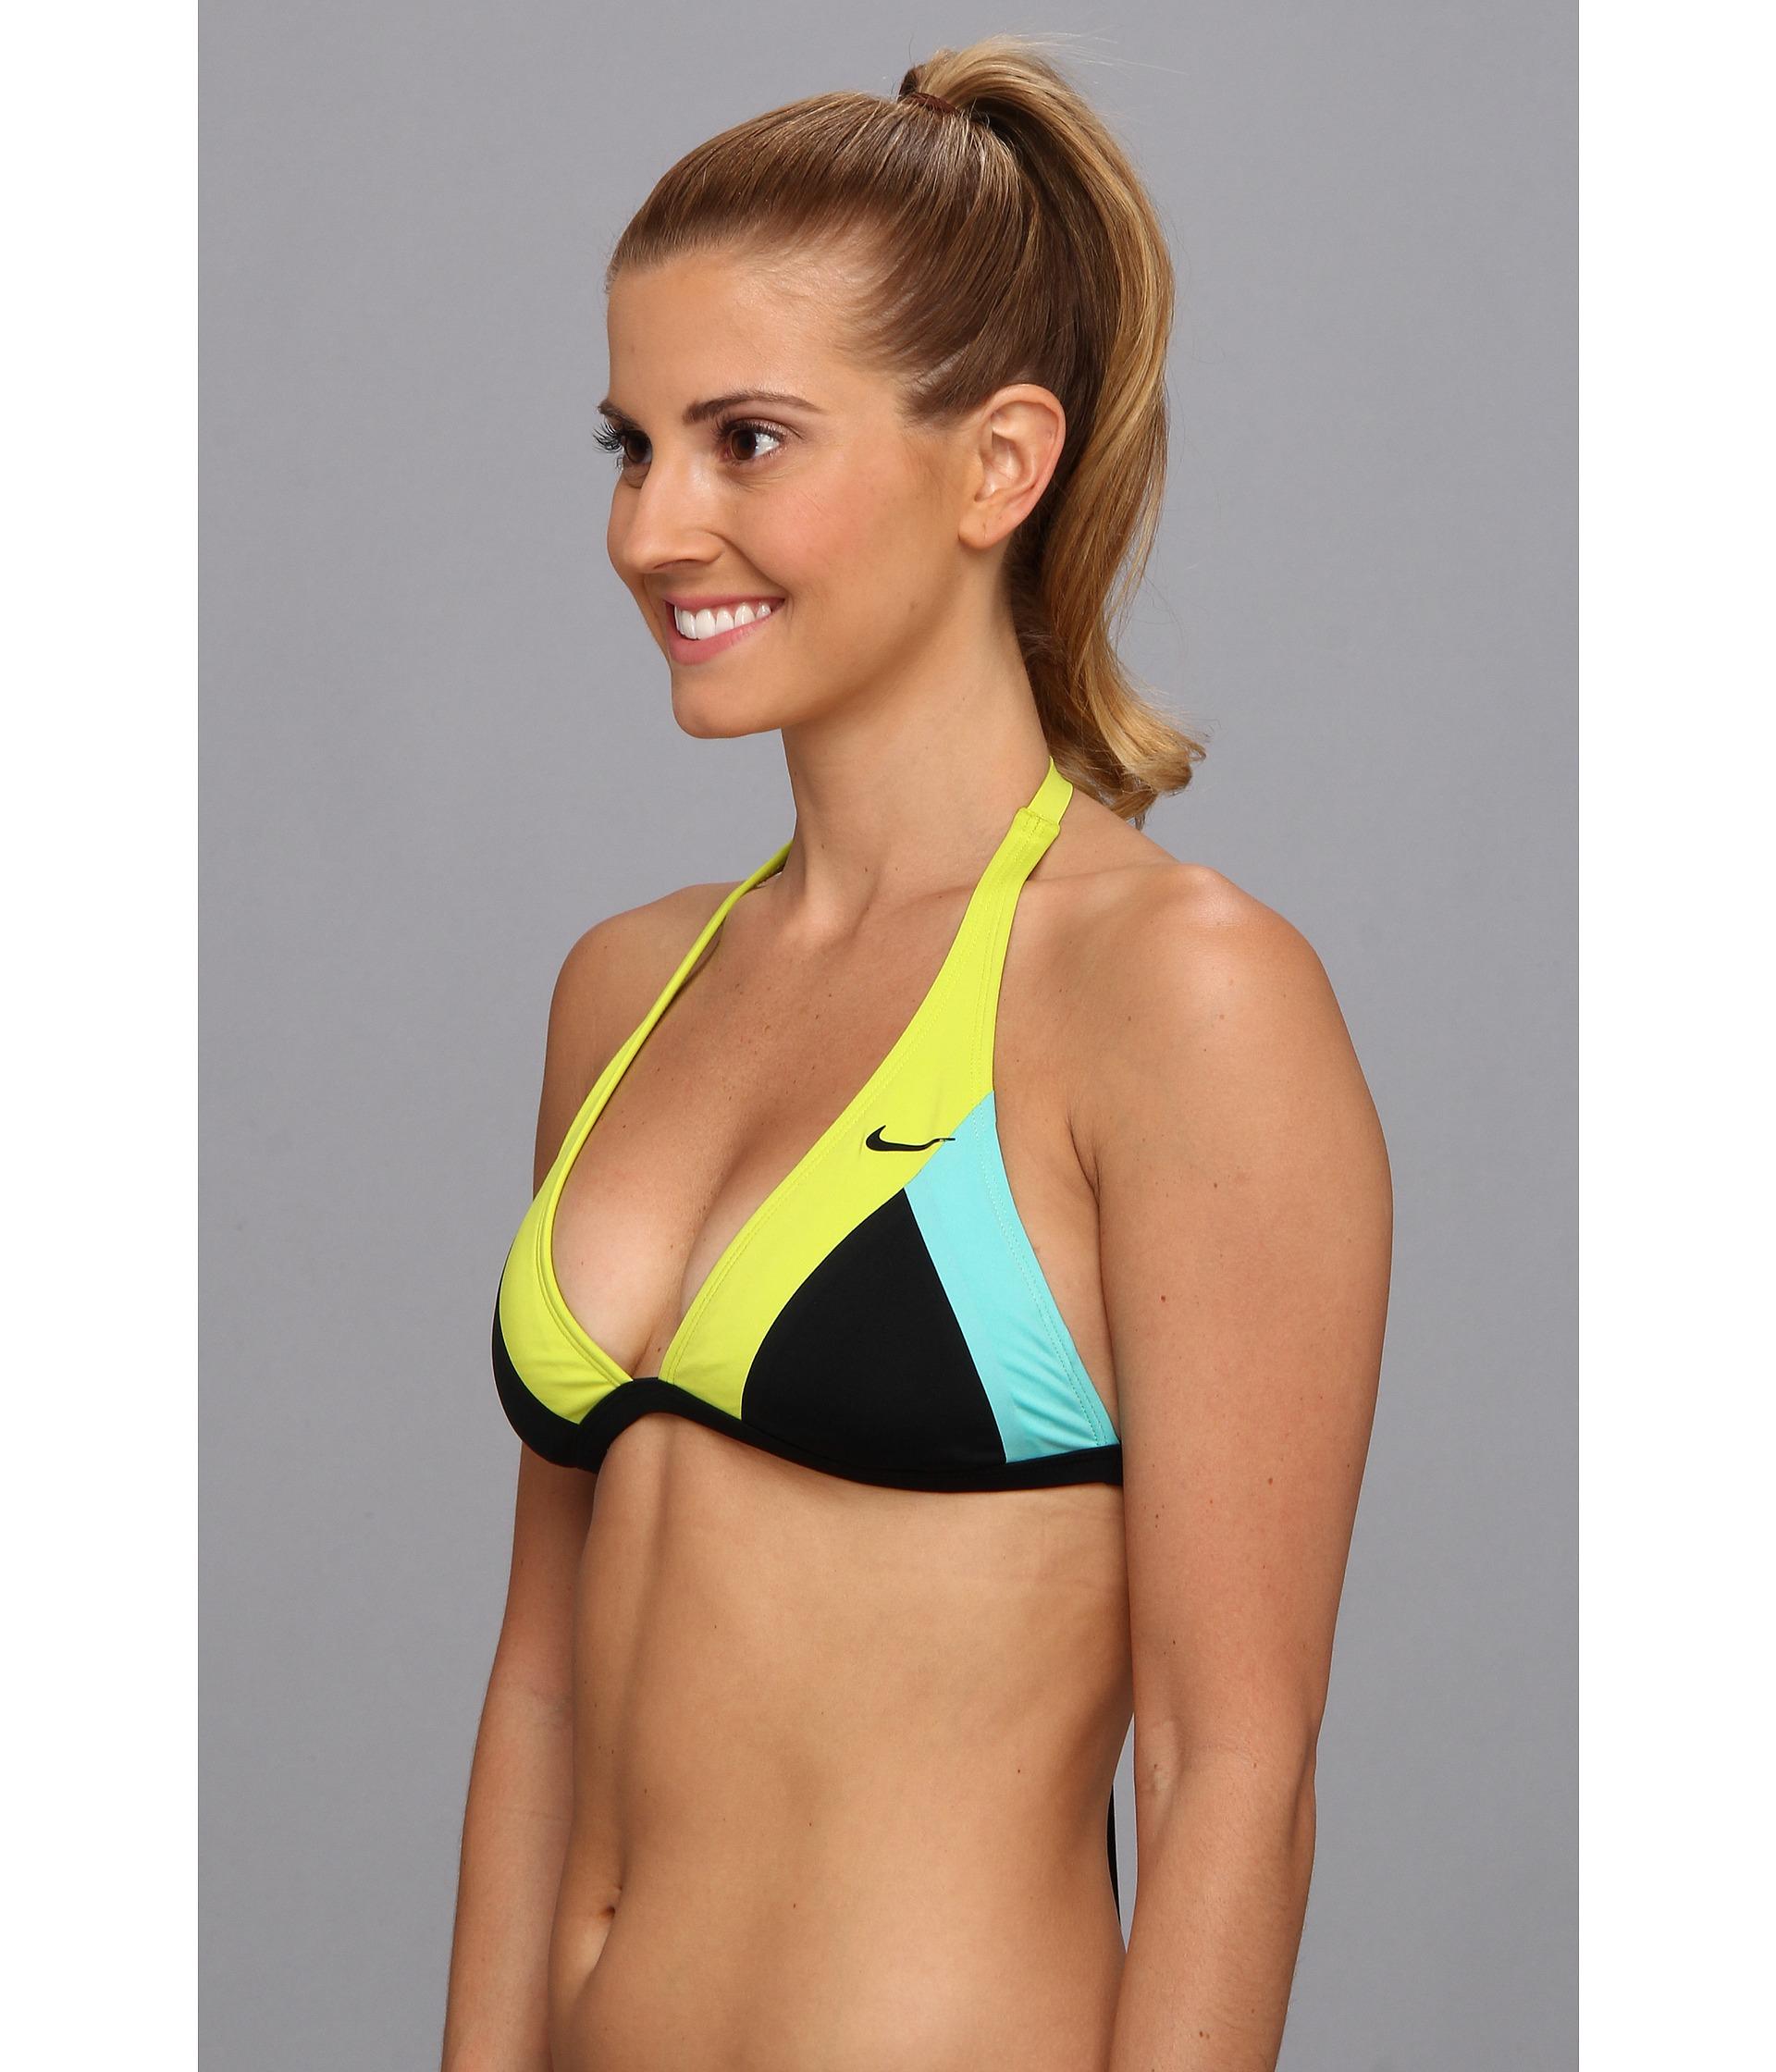 99e922a6e1 Nike Bondi Block Halter Bra Top in Yellow - Lyst